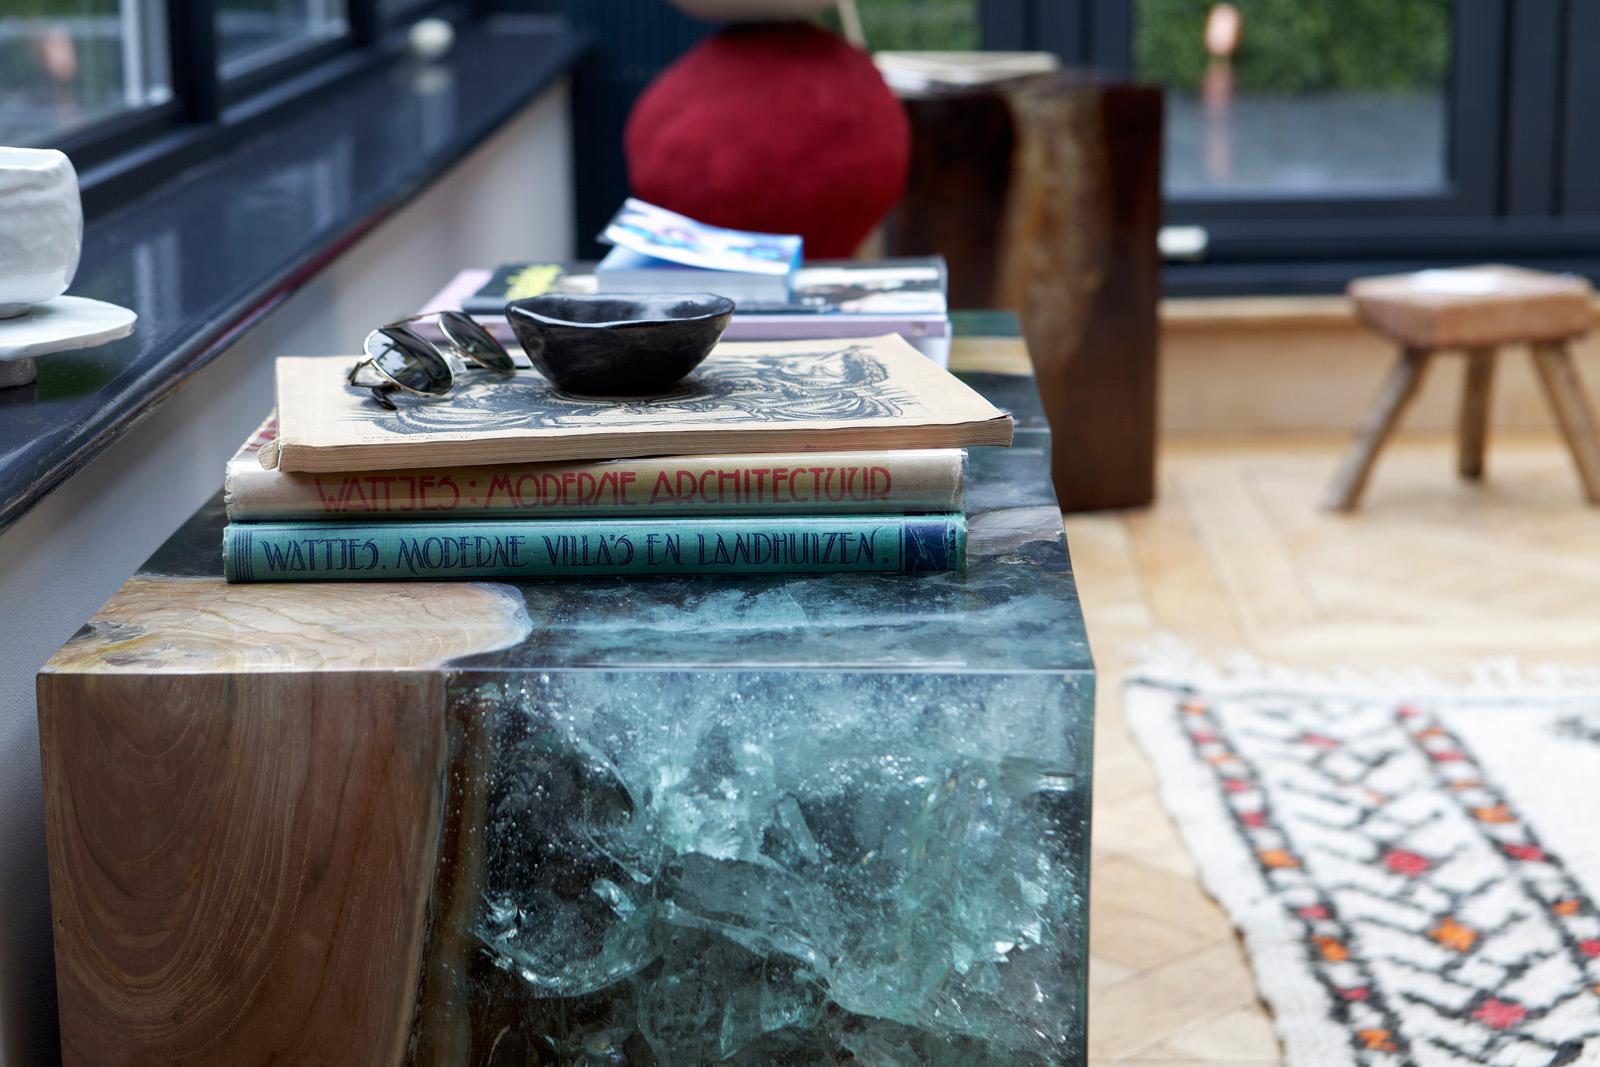 Architecture Coffee Table Books Santaconapp